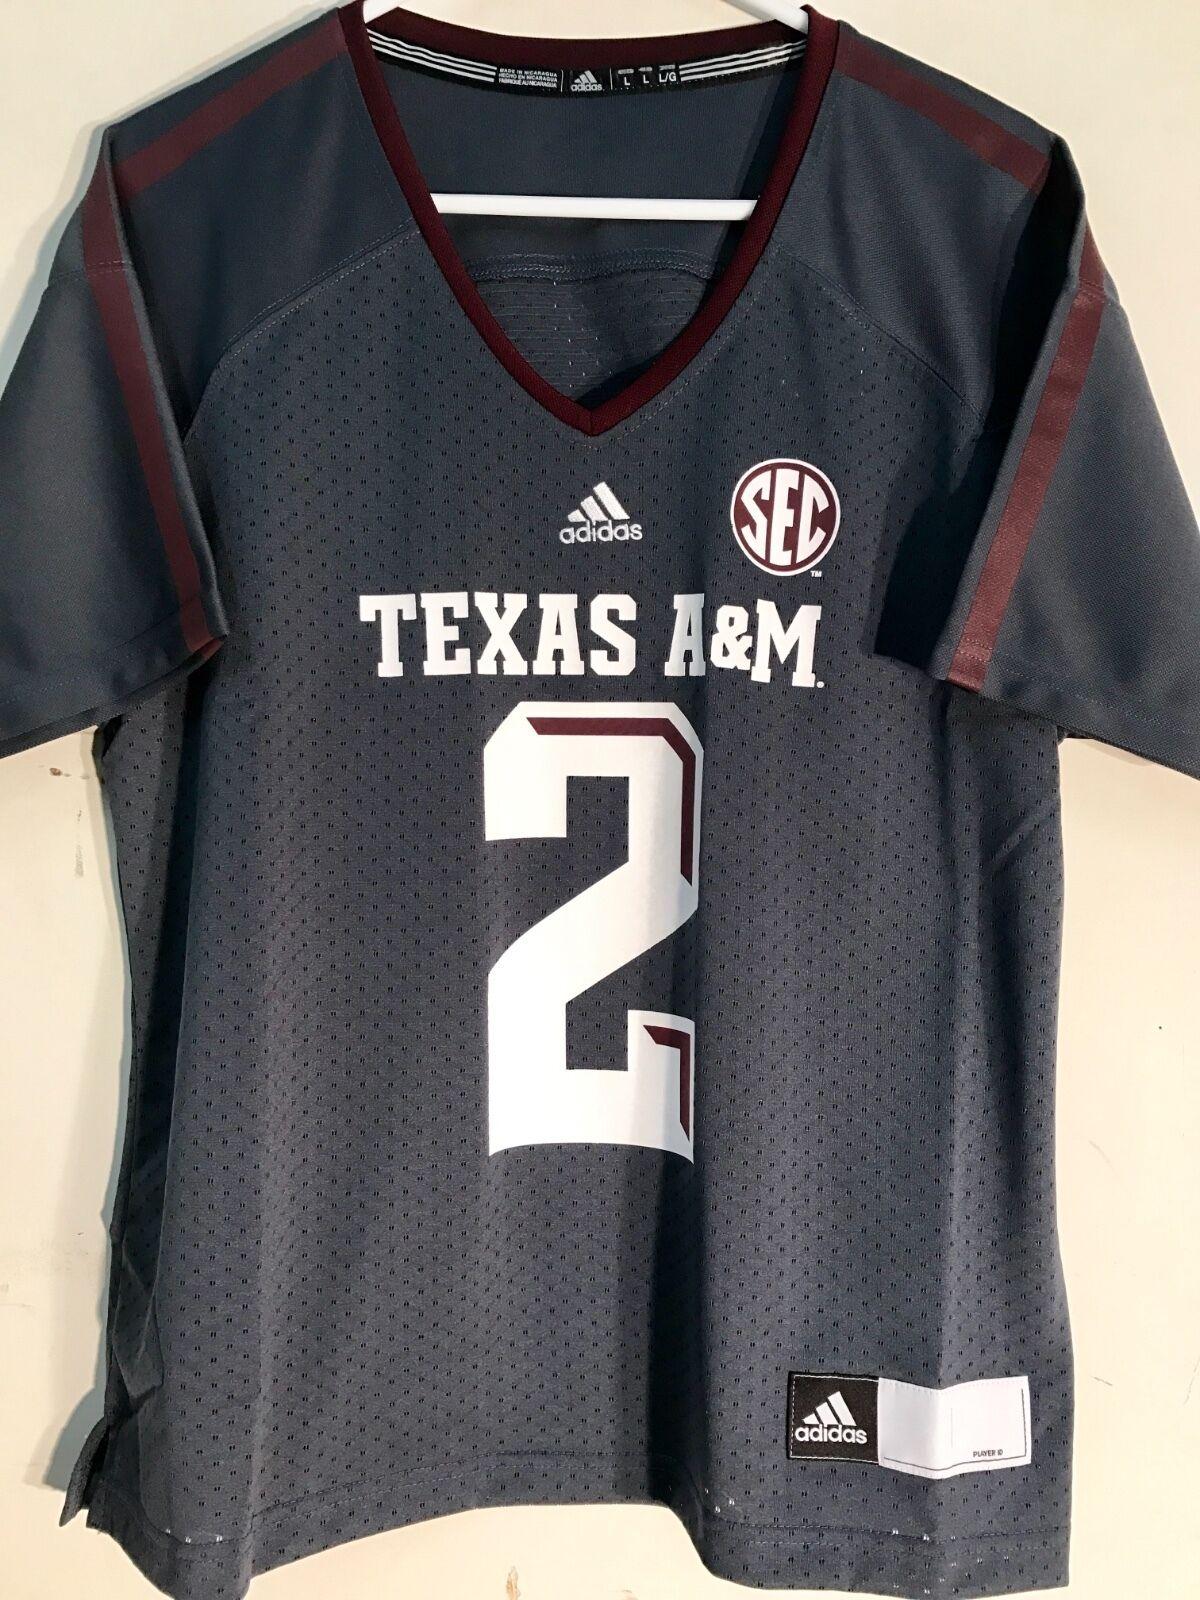 finest selection fd4e8 03a33 adidas Women's NCAA Jersey Texas A&m Aggies #2 Johnny Manziel Grey Sz M